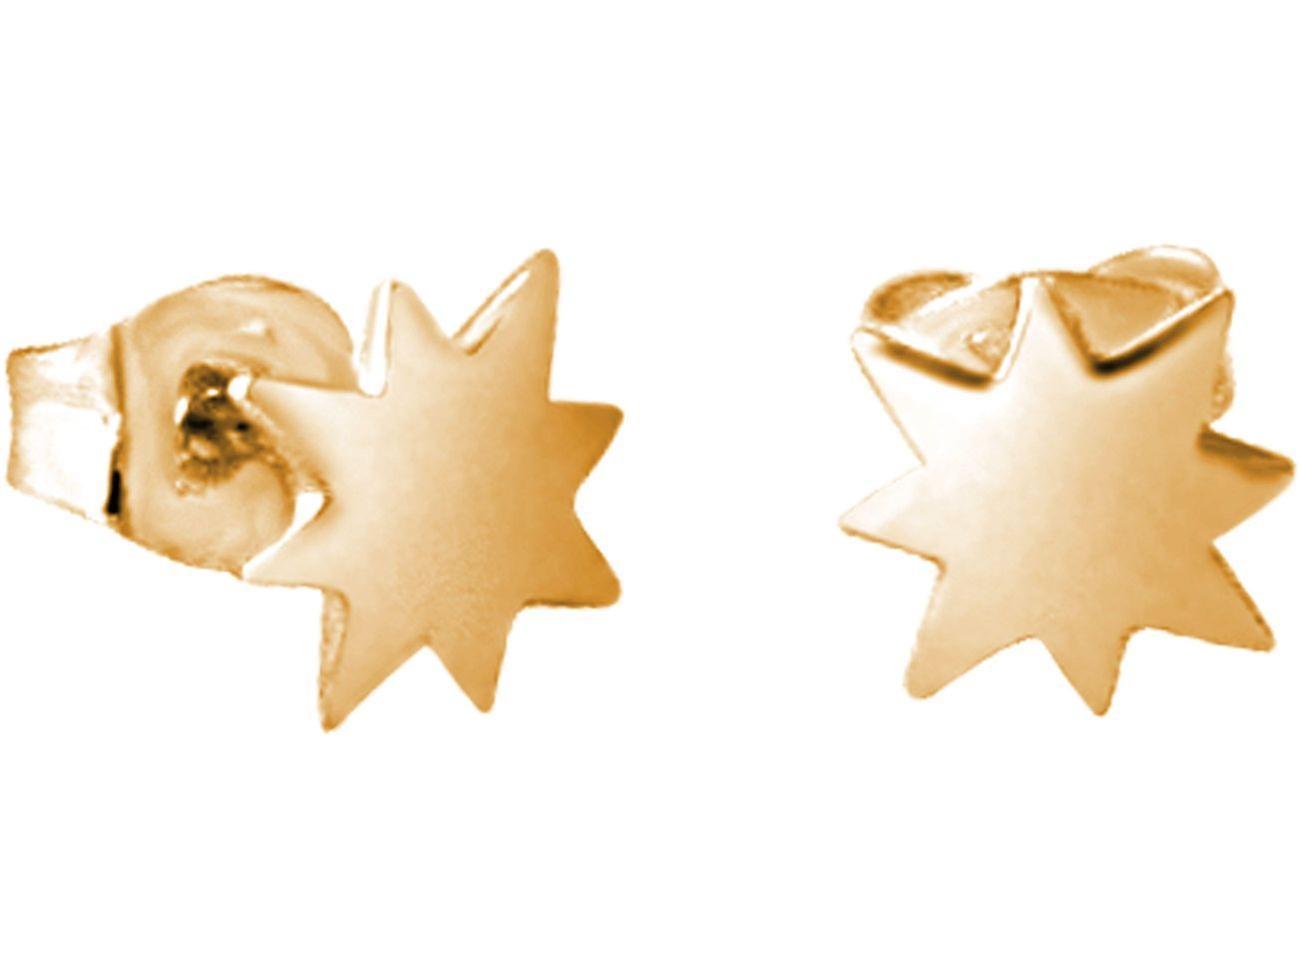 Konstellation Ohrstecker Nordstern Polarstern 925 Silber, vergoldet oder rose